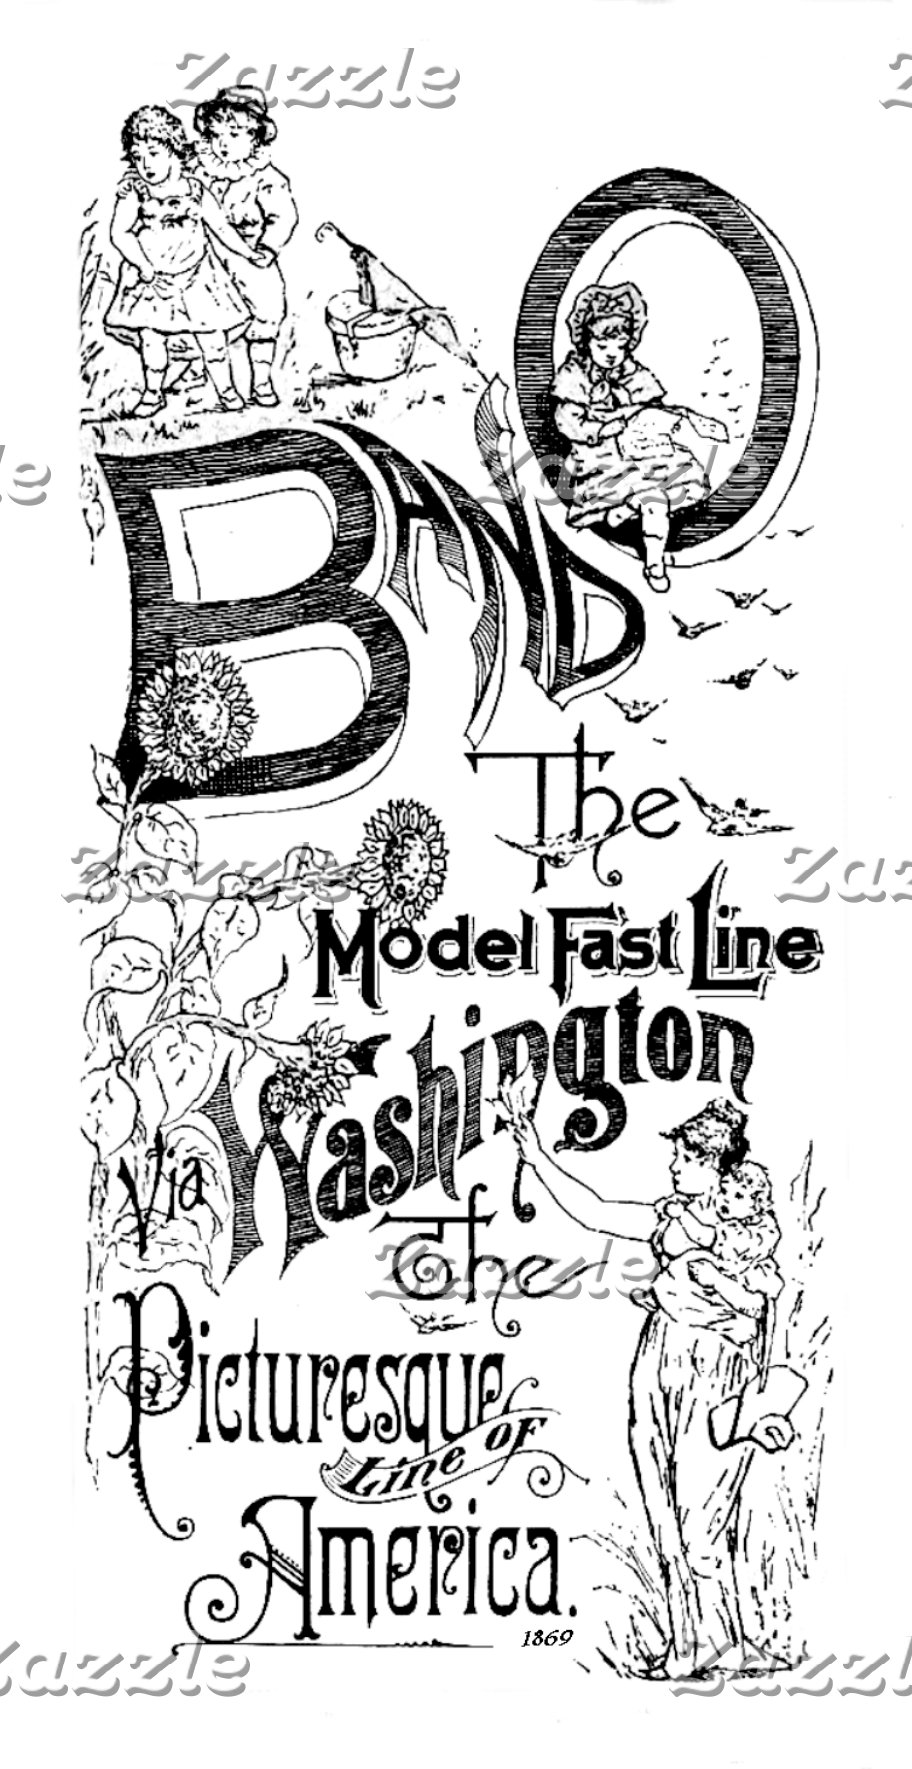 B+O Railroad and Train Gifts